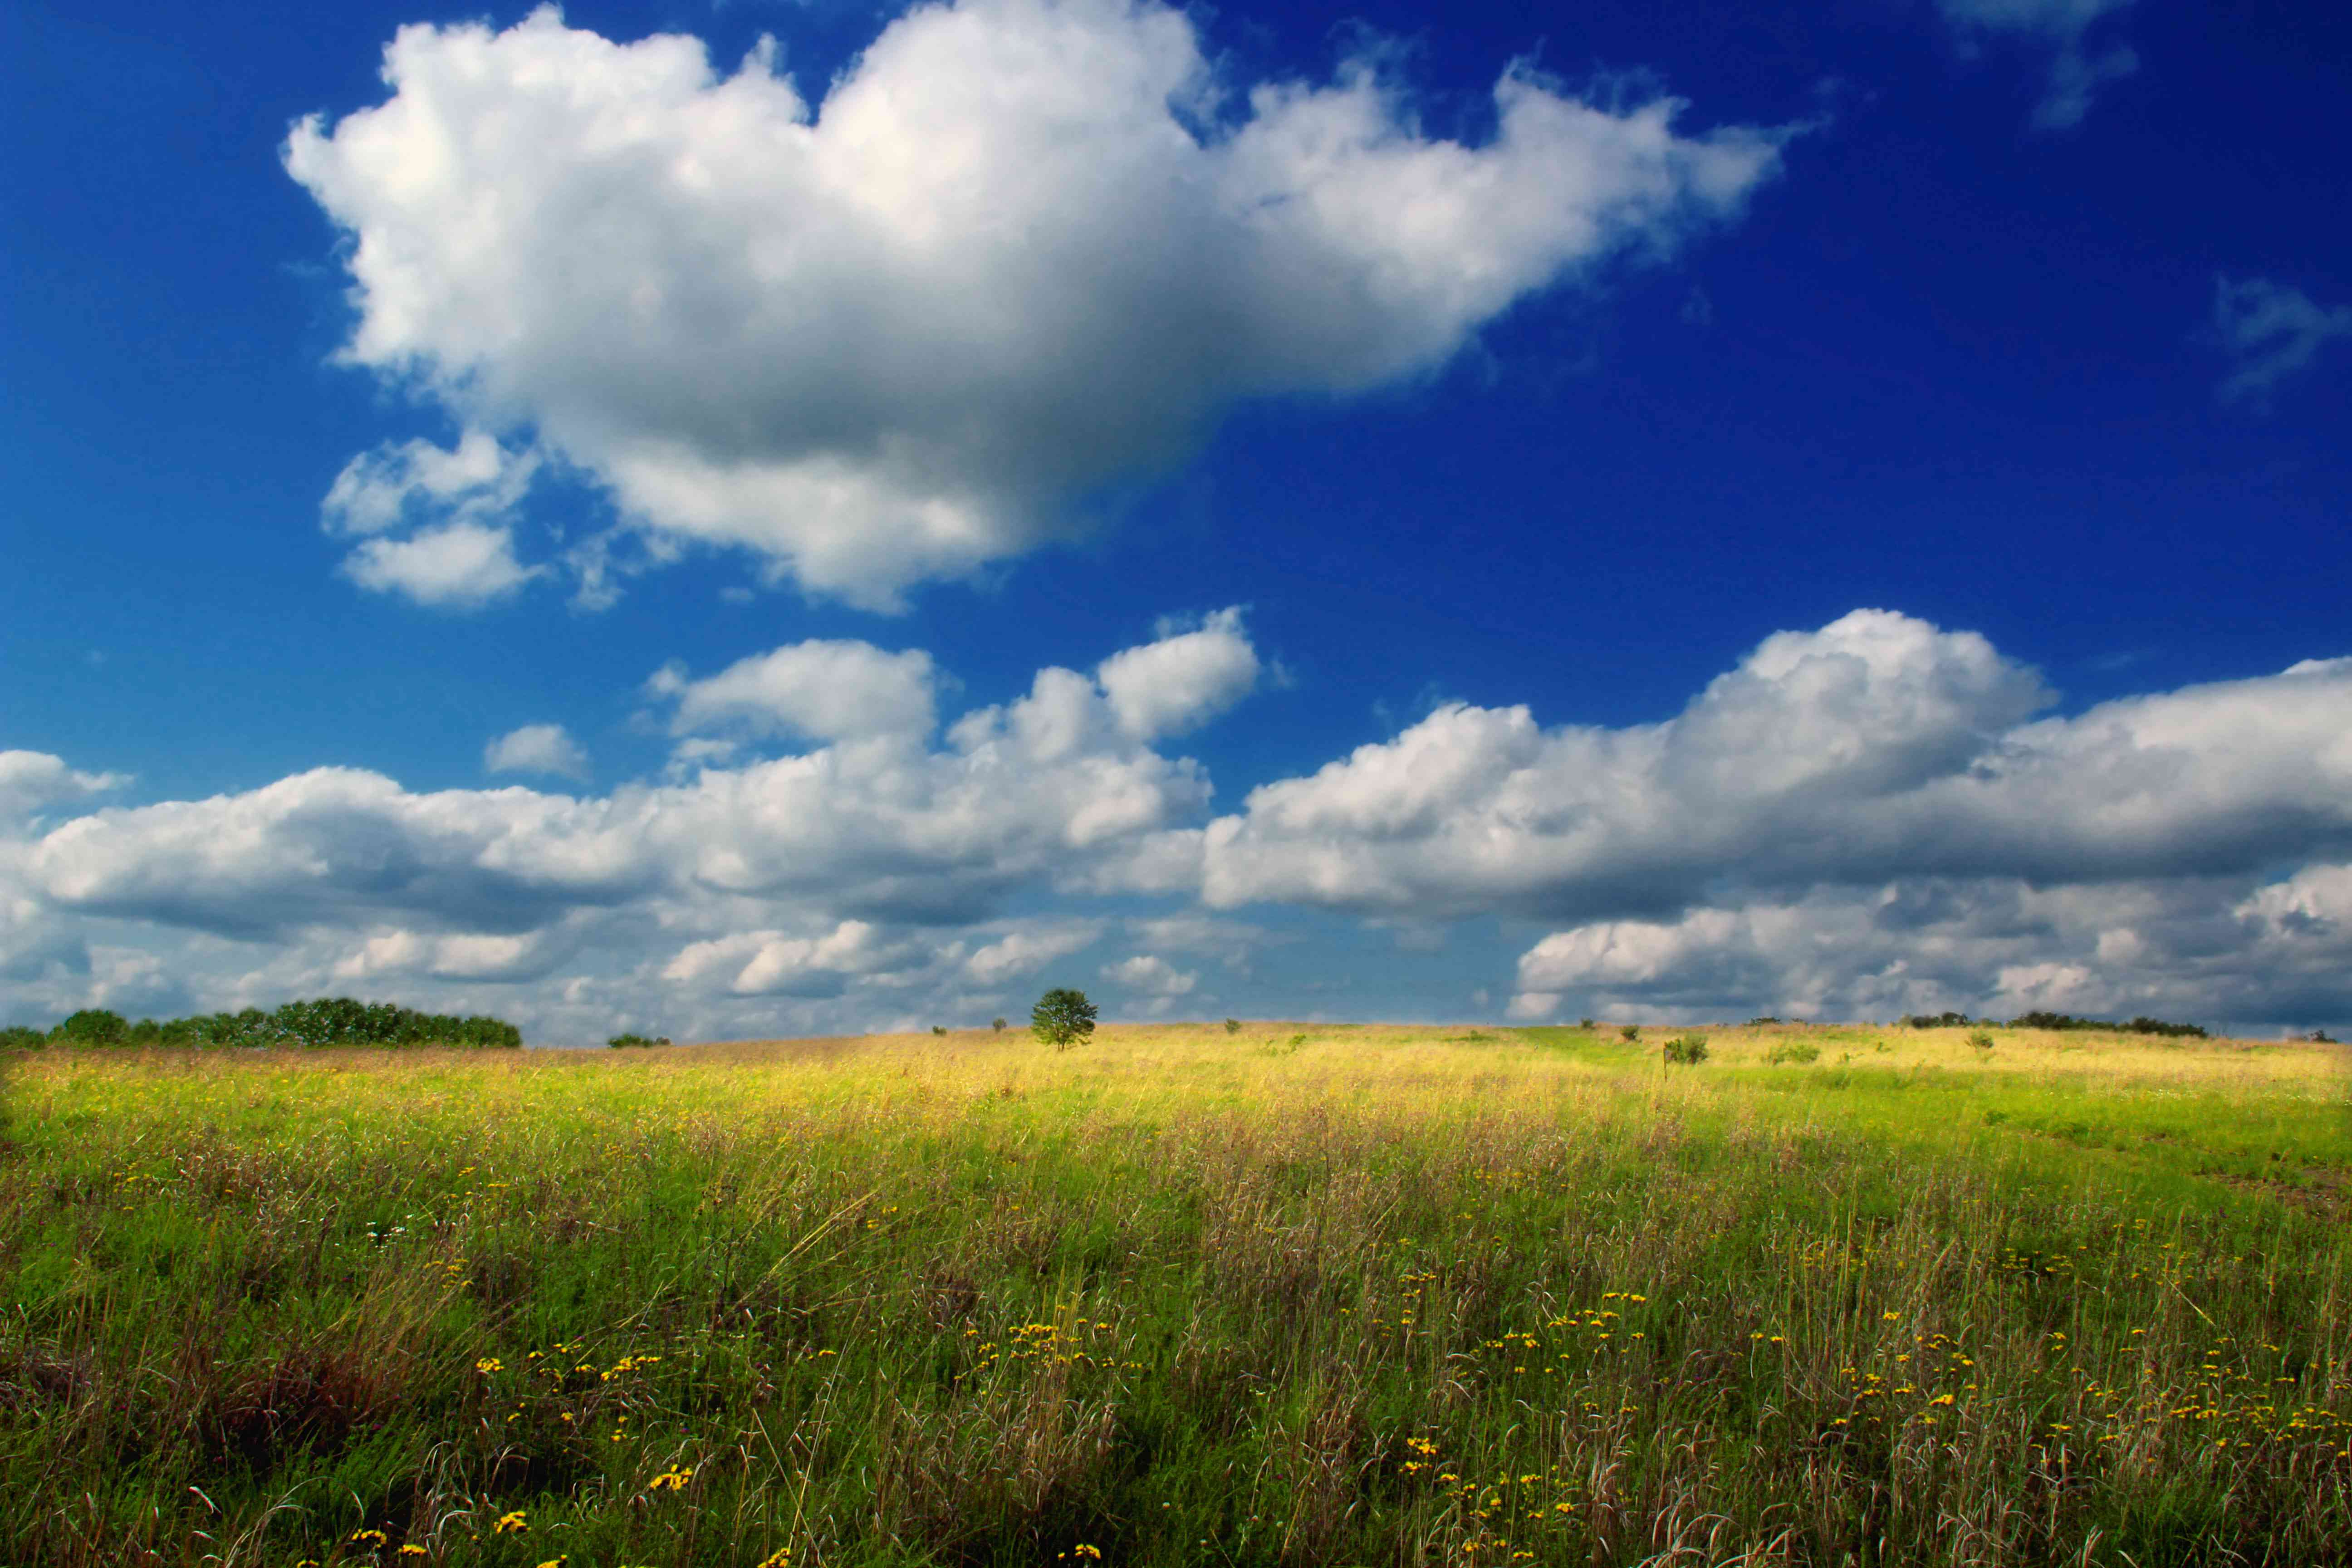 grassland in Centre County, Pennsylvania